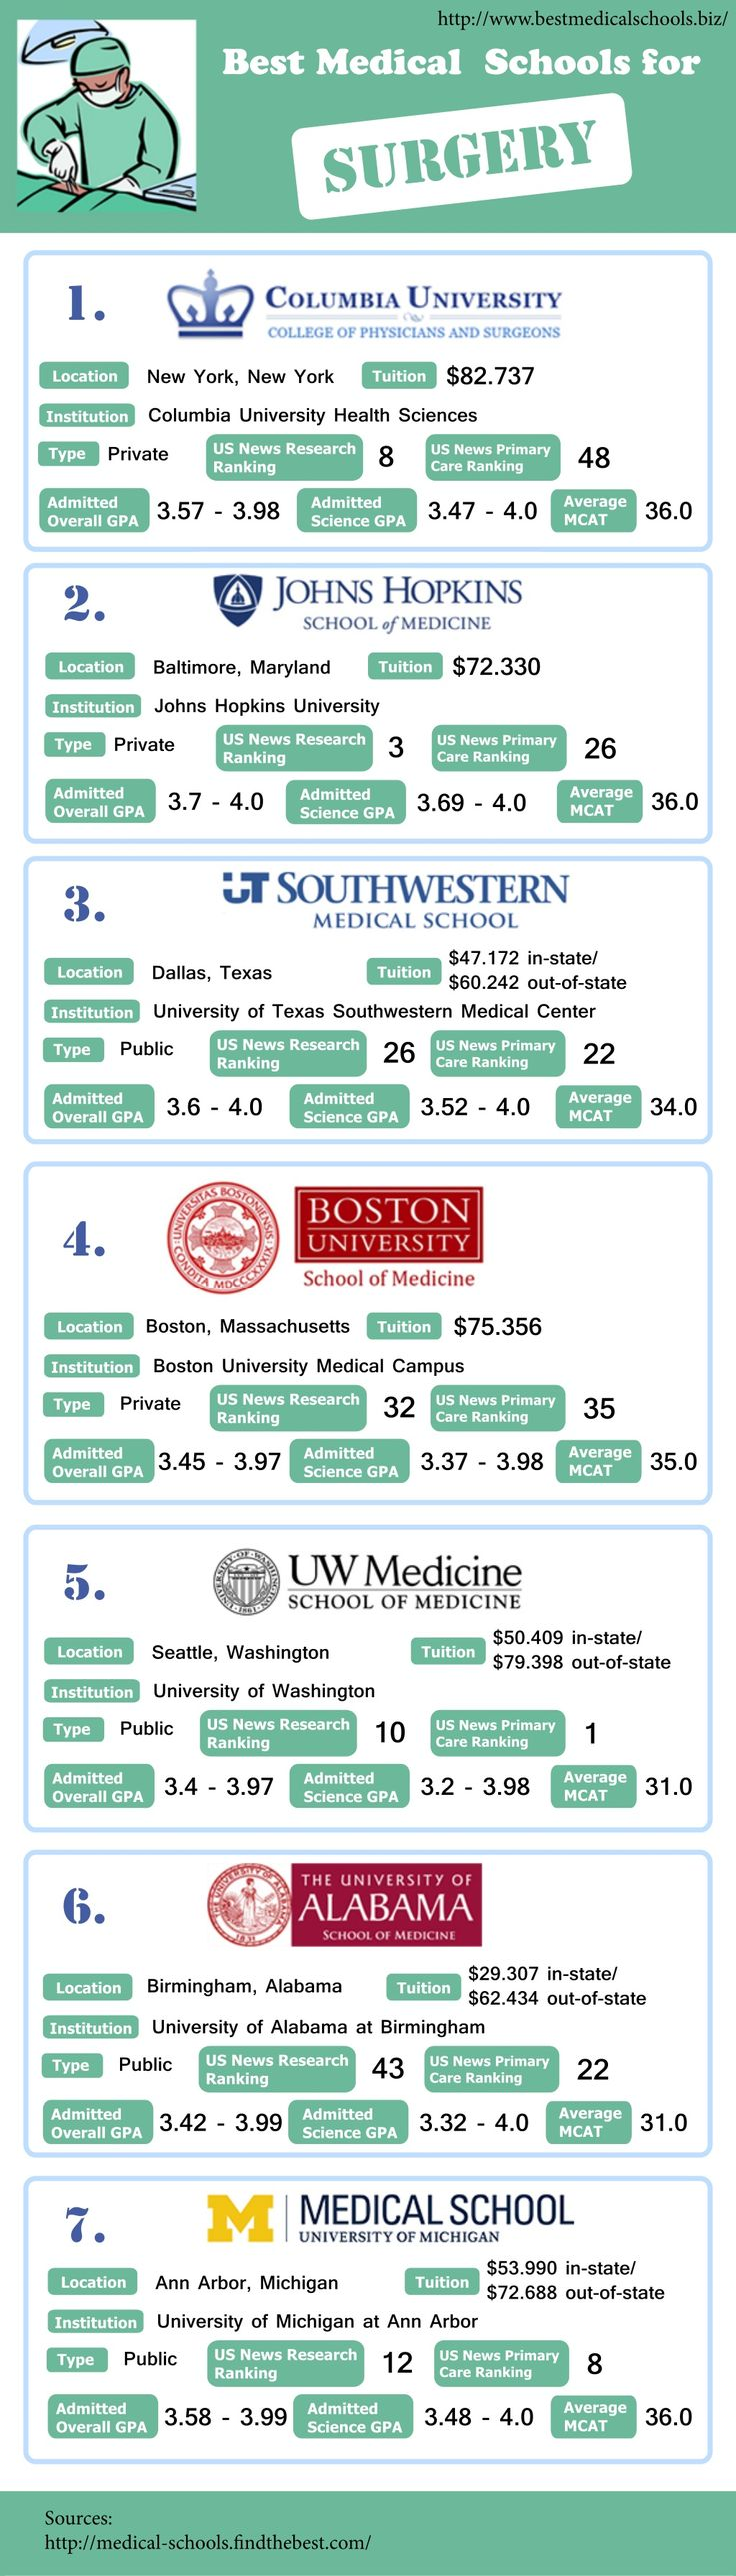 best medical schools for surgery by Best World Medical Schools Service via slideshare